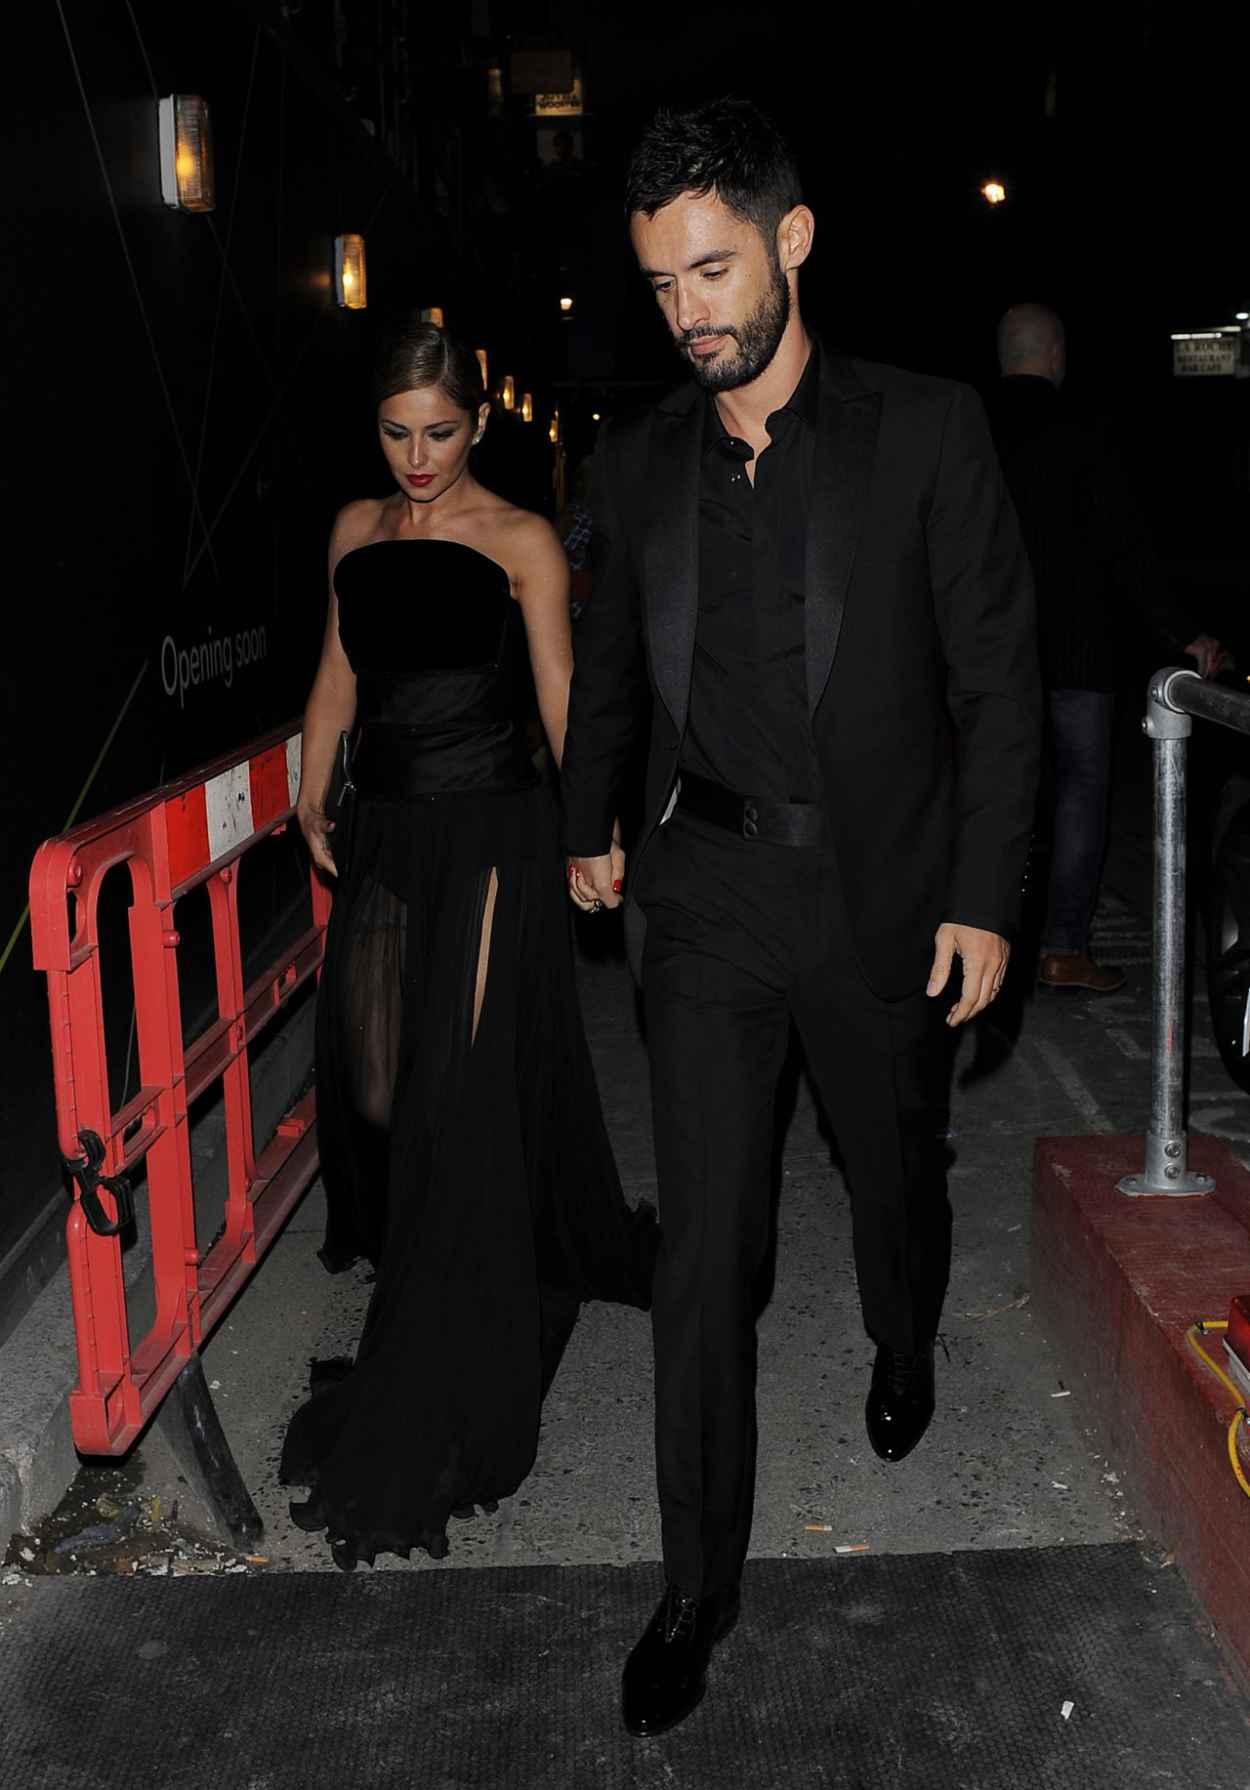 Cheryl Cole (Cheryl Fernandez-Versini) - Wedding Party in London - July 2015-5